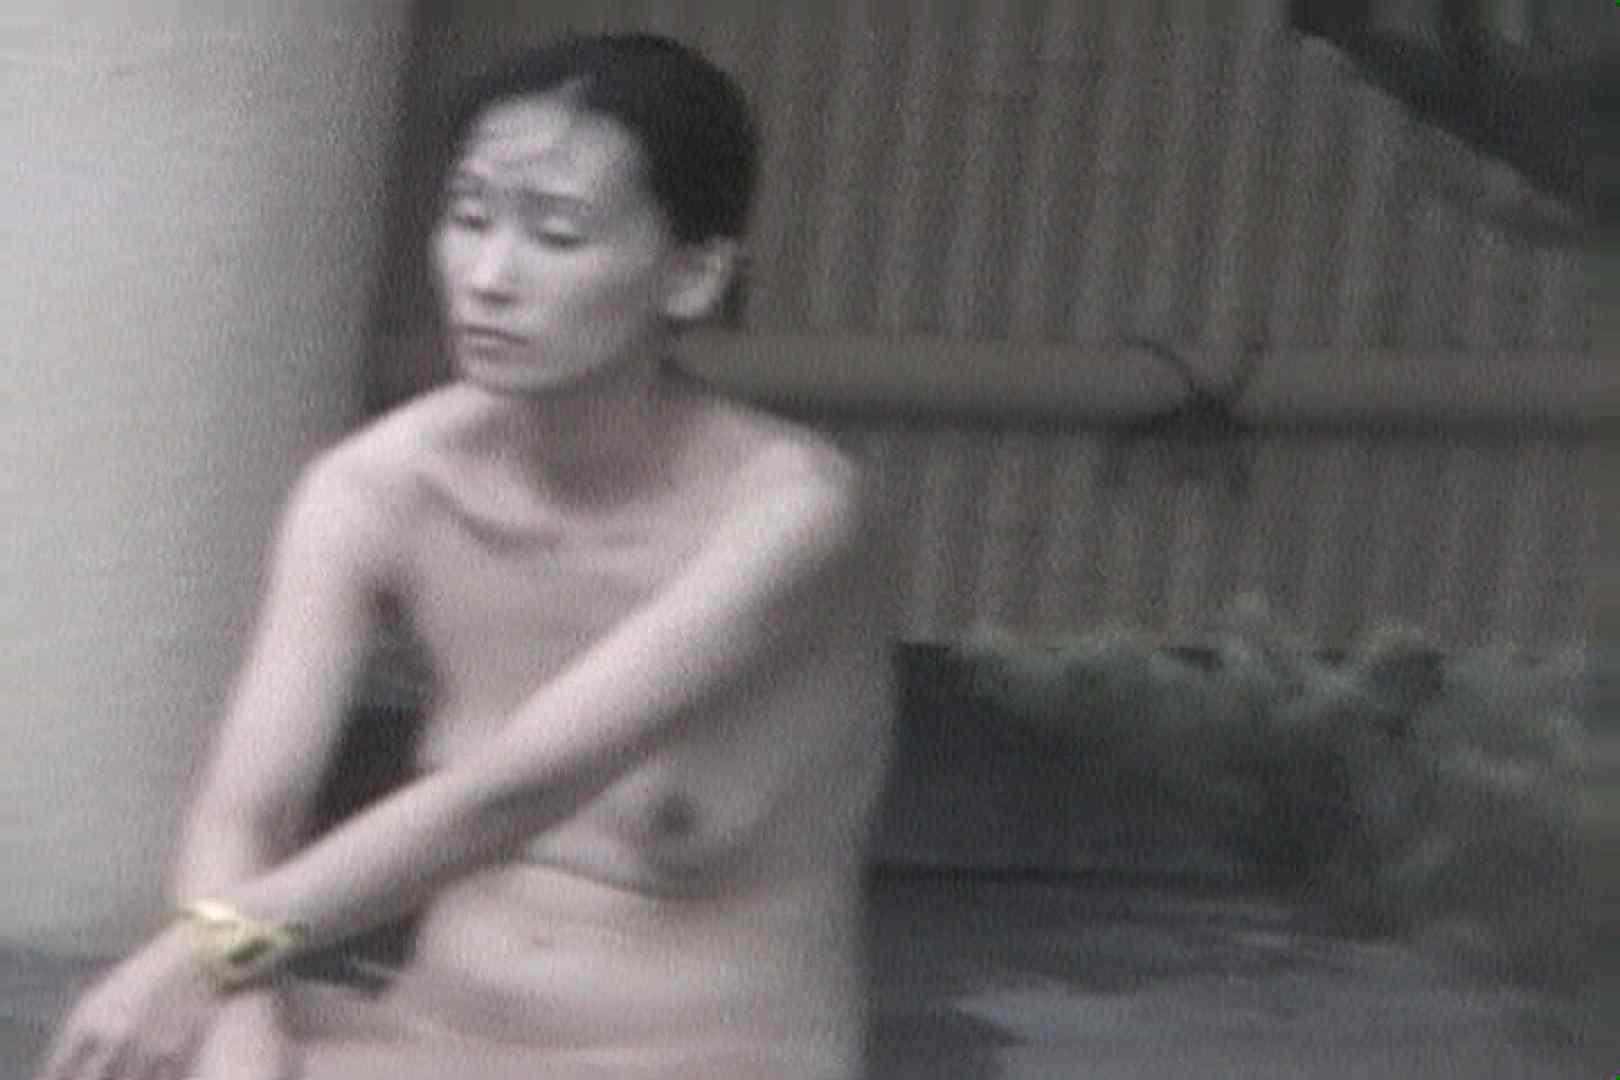 Aquaな露天風呂Vol.557 盗撮 盗み撮り動画キャプチャ 34連発 23